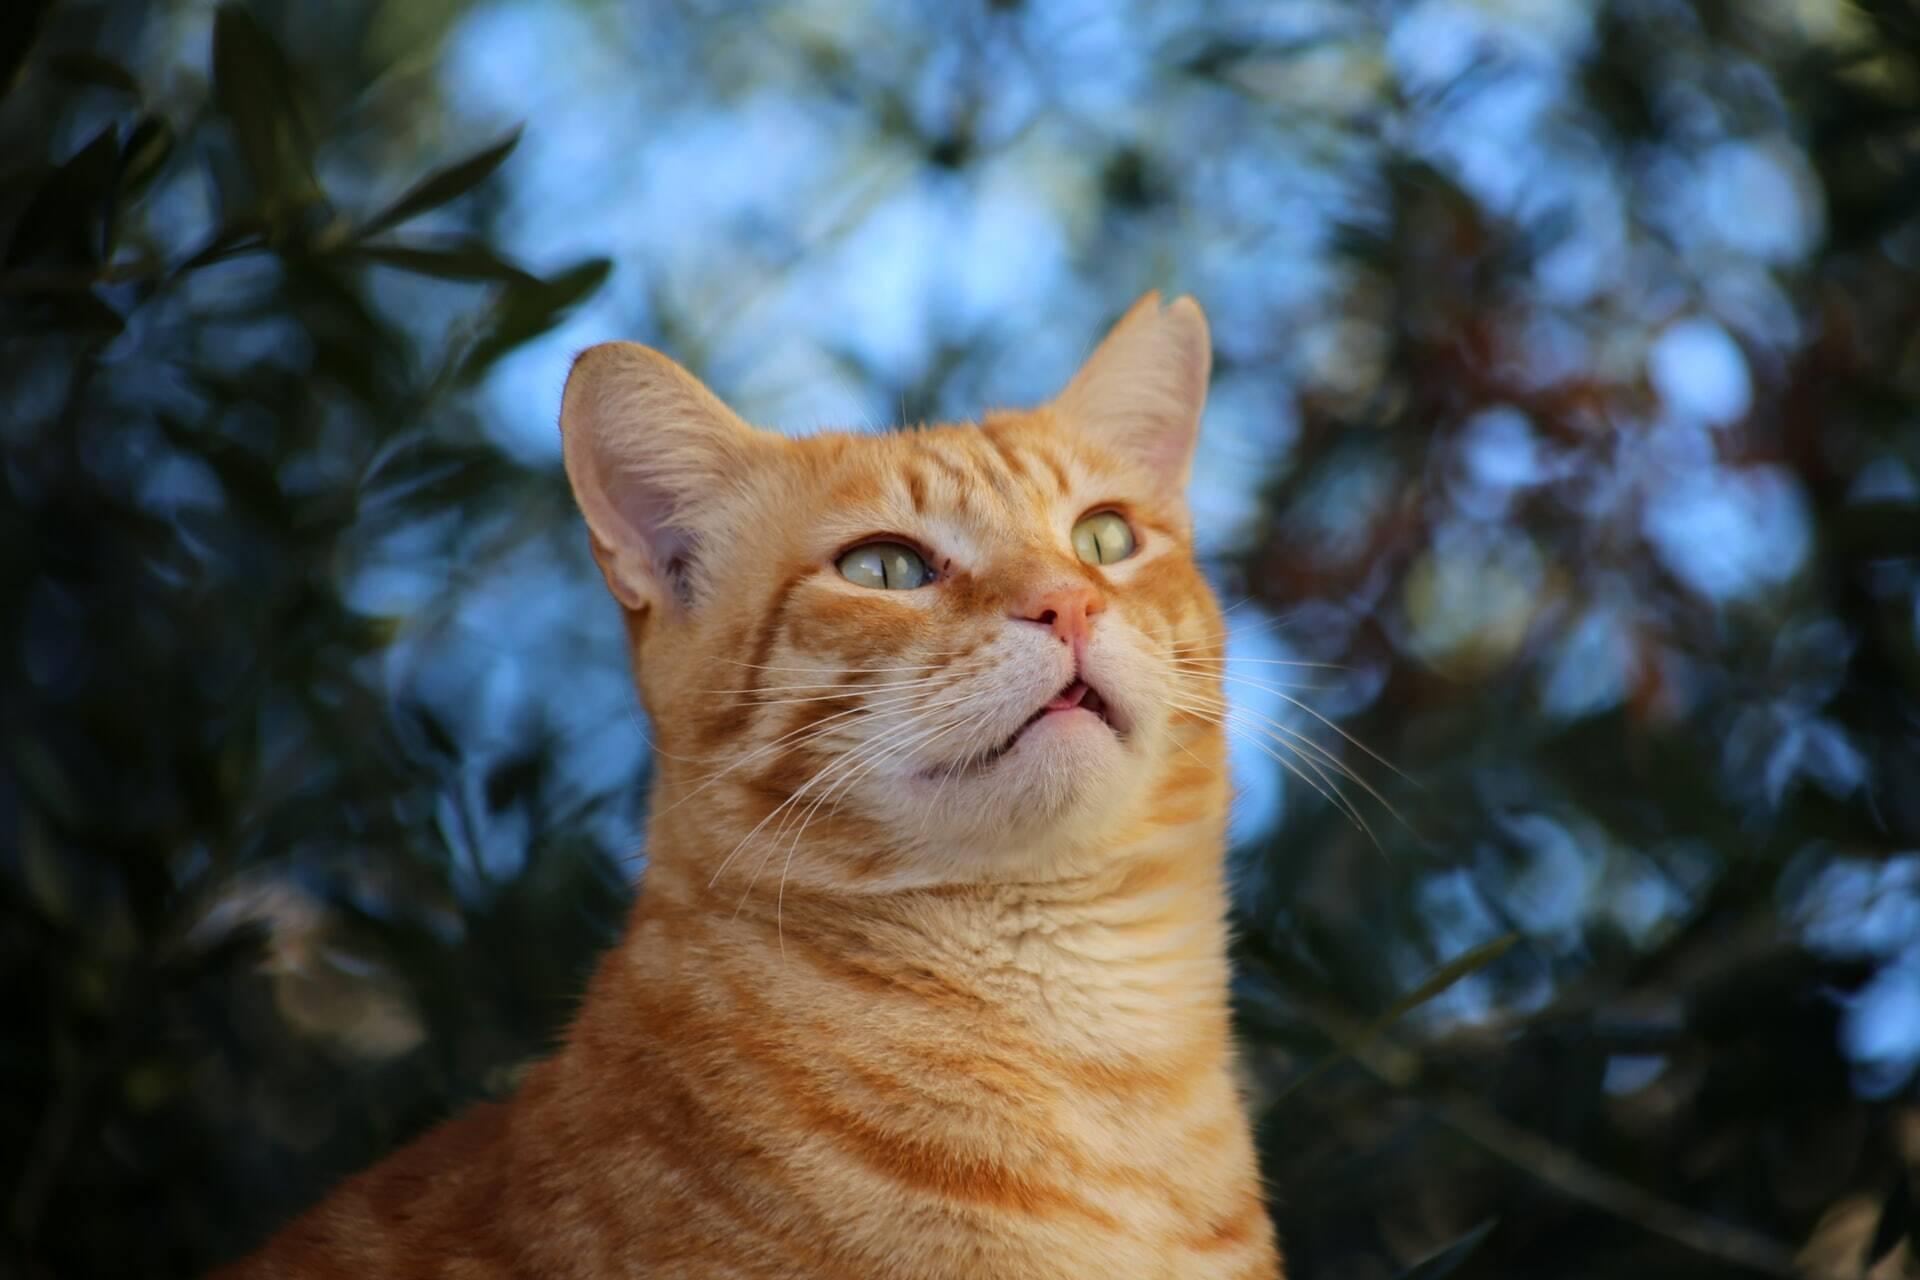 Quer que seu gato seja mais afetuoso? Deixe que ele se sinta no comando